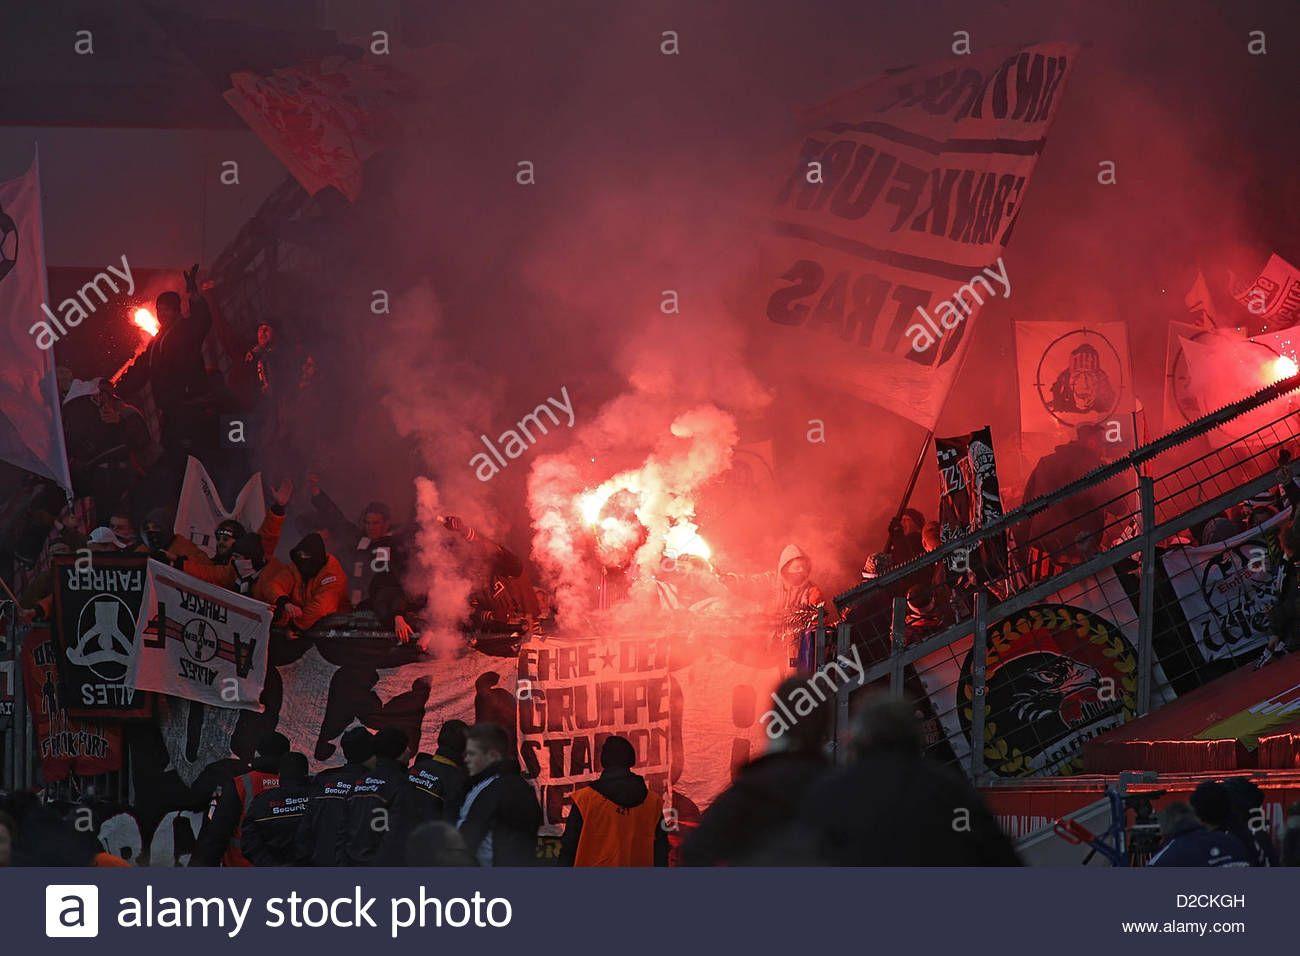 19.01.2013, Xovx, 1.bundesliga, Bayer 04 Leverkusen - Eintracht ...